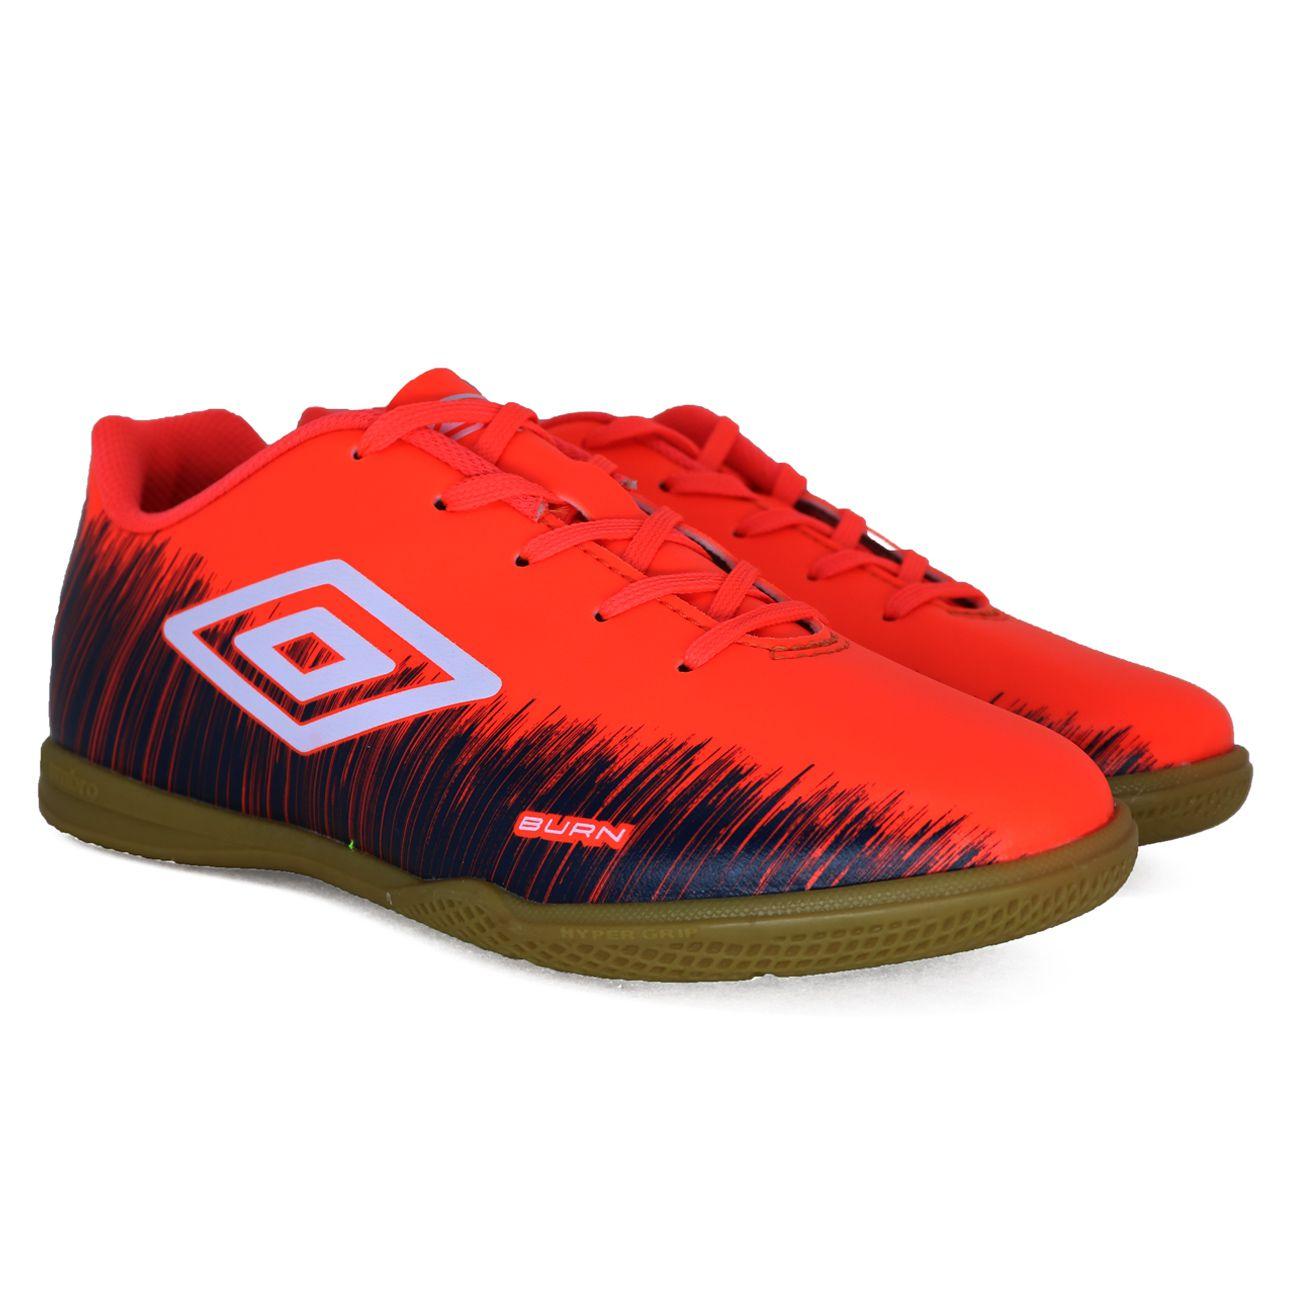 Chuteira Umbro Burn Futsal Juvenil Coral